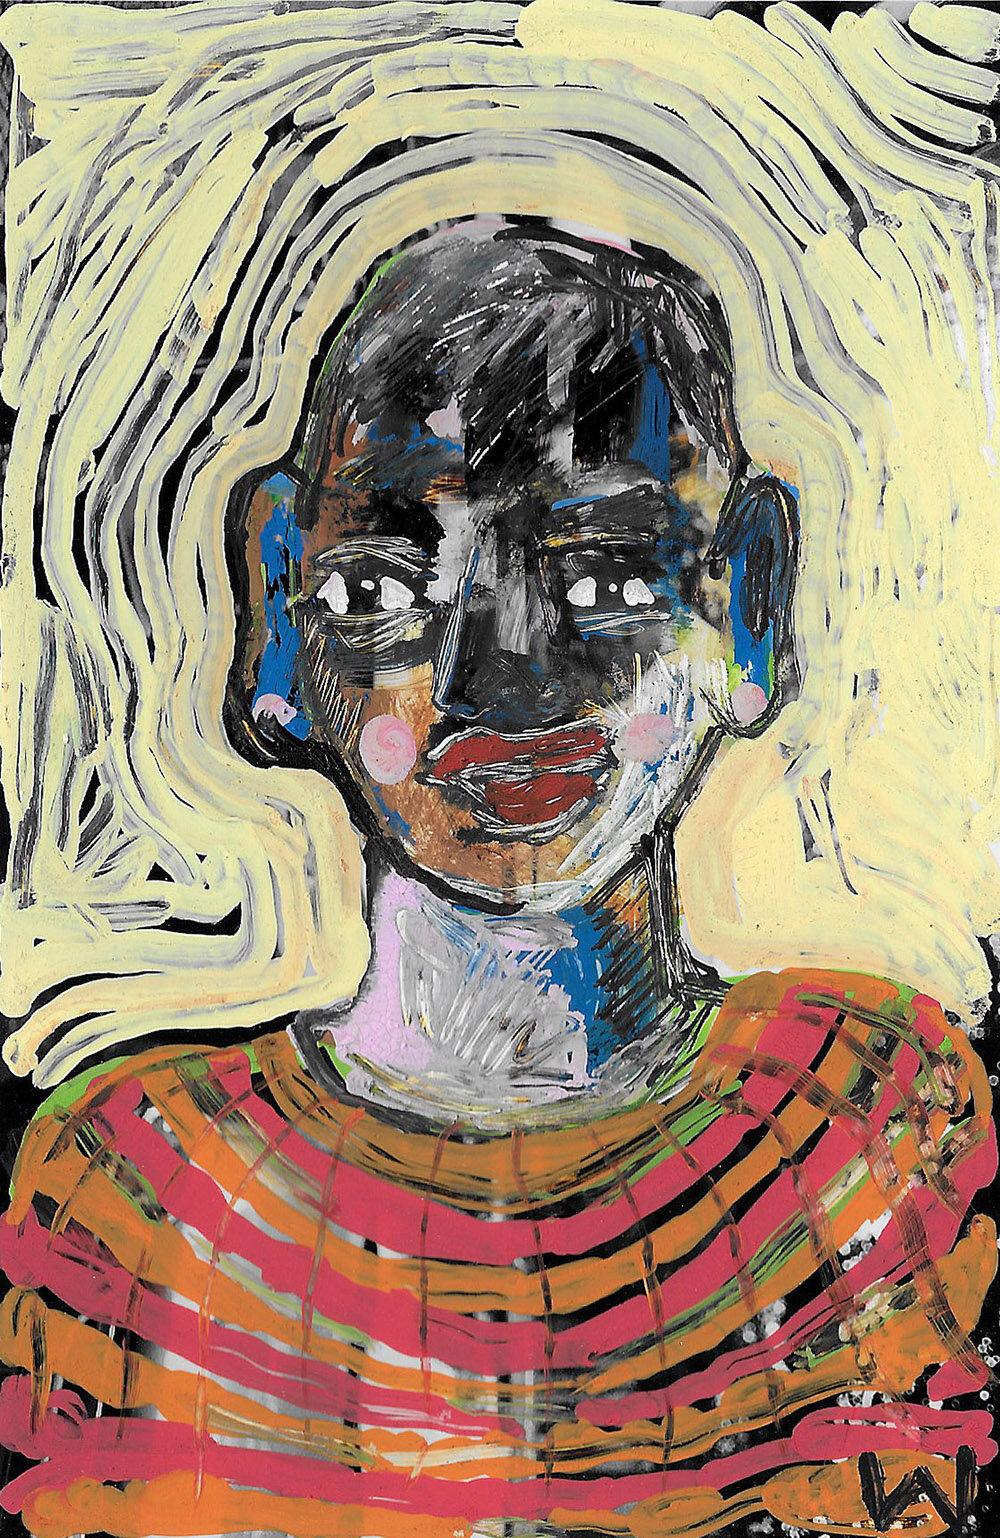 'Angry Youth' 2017, Berlin, Inkjet photograph & Acrylic, 10x15cm